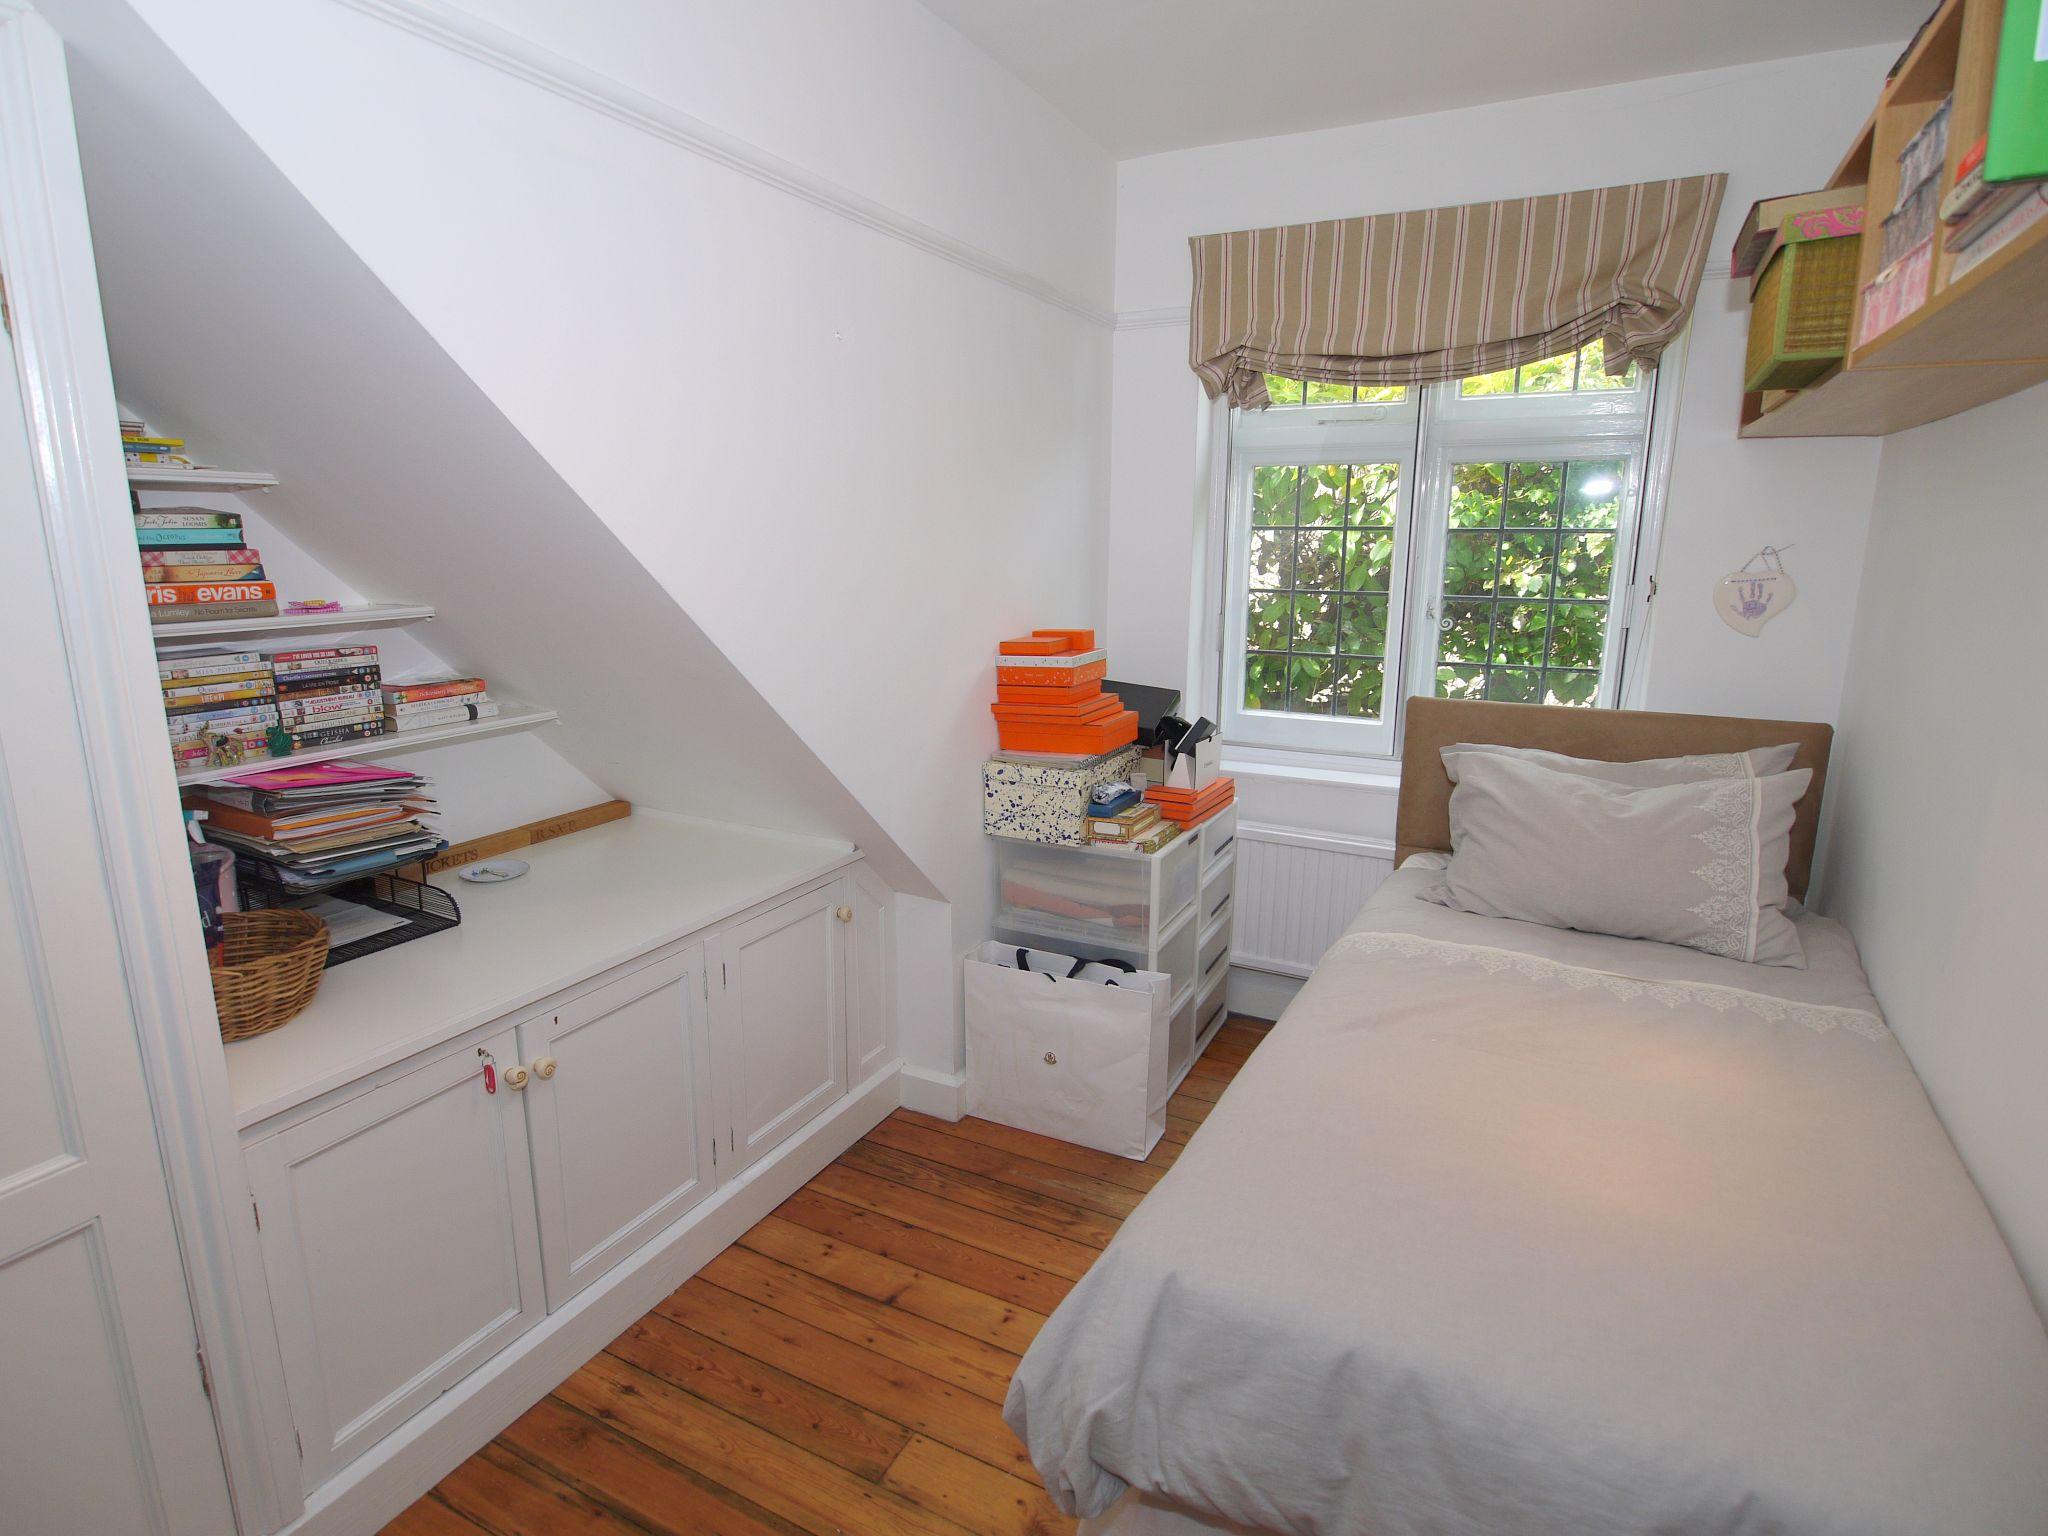 3 bedroom detached house Sold in Sevenoaks - Photograph 10